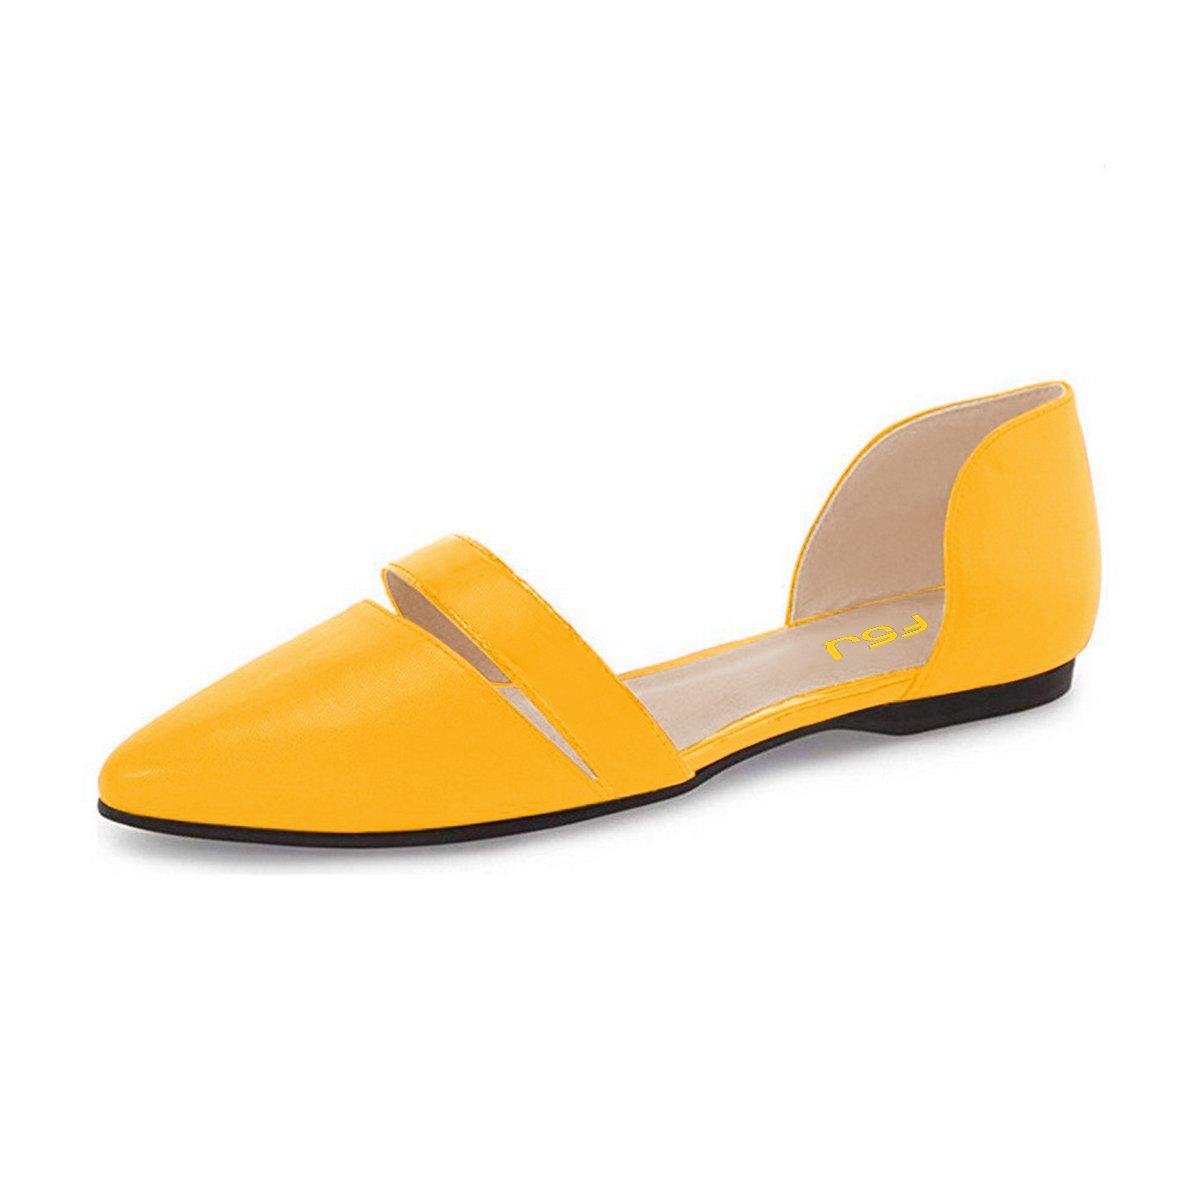 FSJ Women Cute D'Orsay Ballet Flats for Comfort Pointed Toe Low Heels Dress Shoes Size 4-15 US B01GEGLFT8 11 B(M) US|Yellow